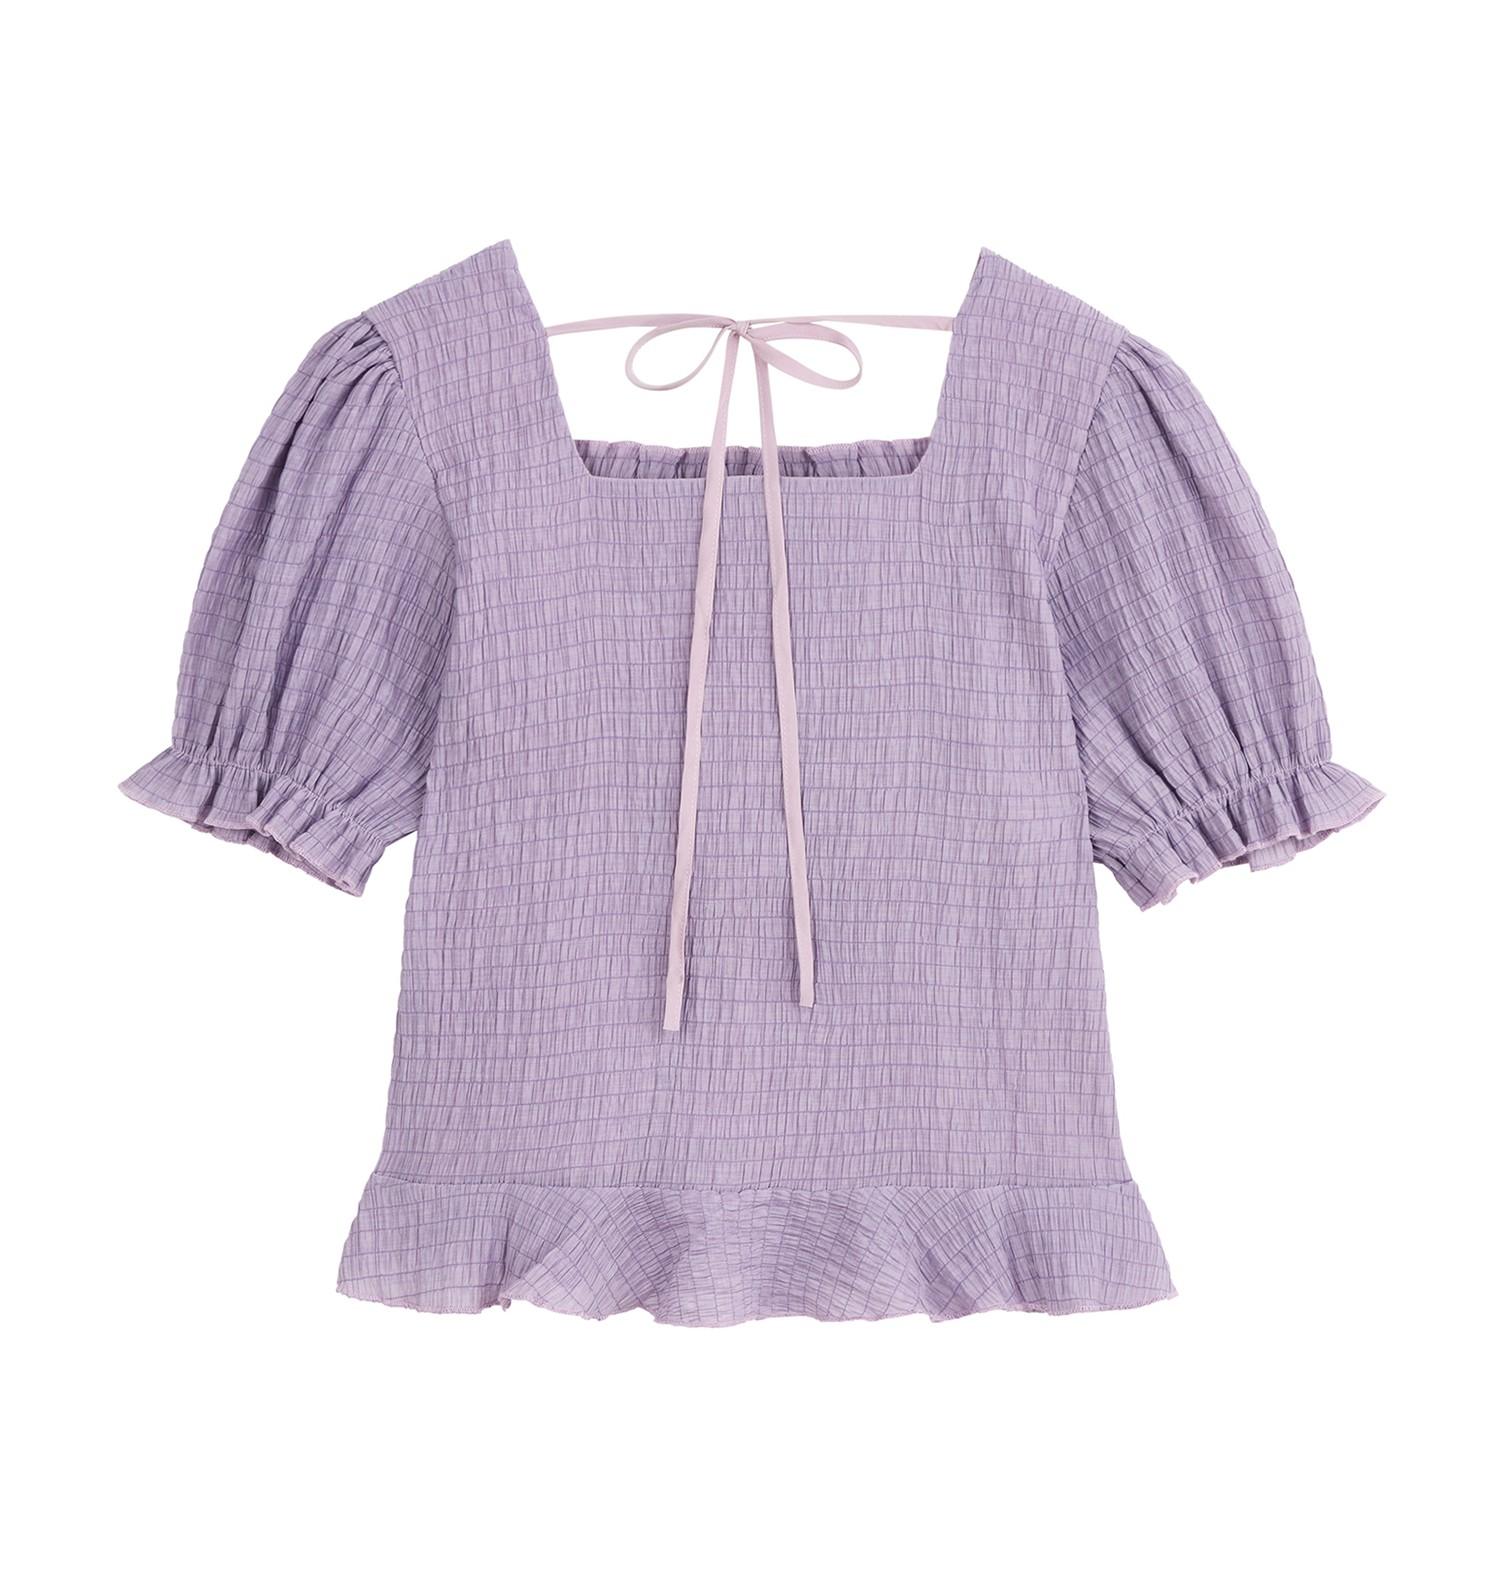 product-Ruiteng-Tops For Girls Women Clothing 2021 Amazon Top Seller Chiffon Sweet Square Collar Sho